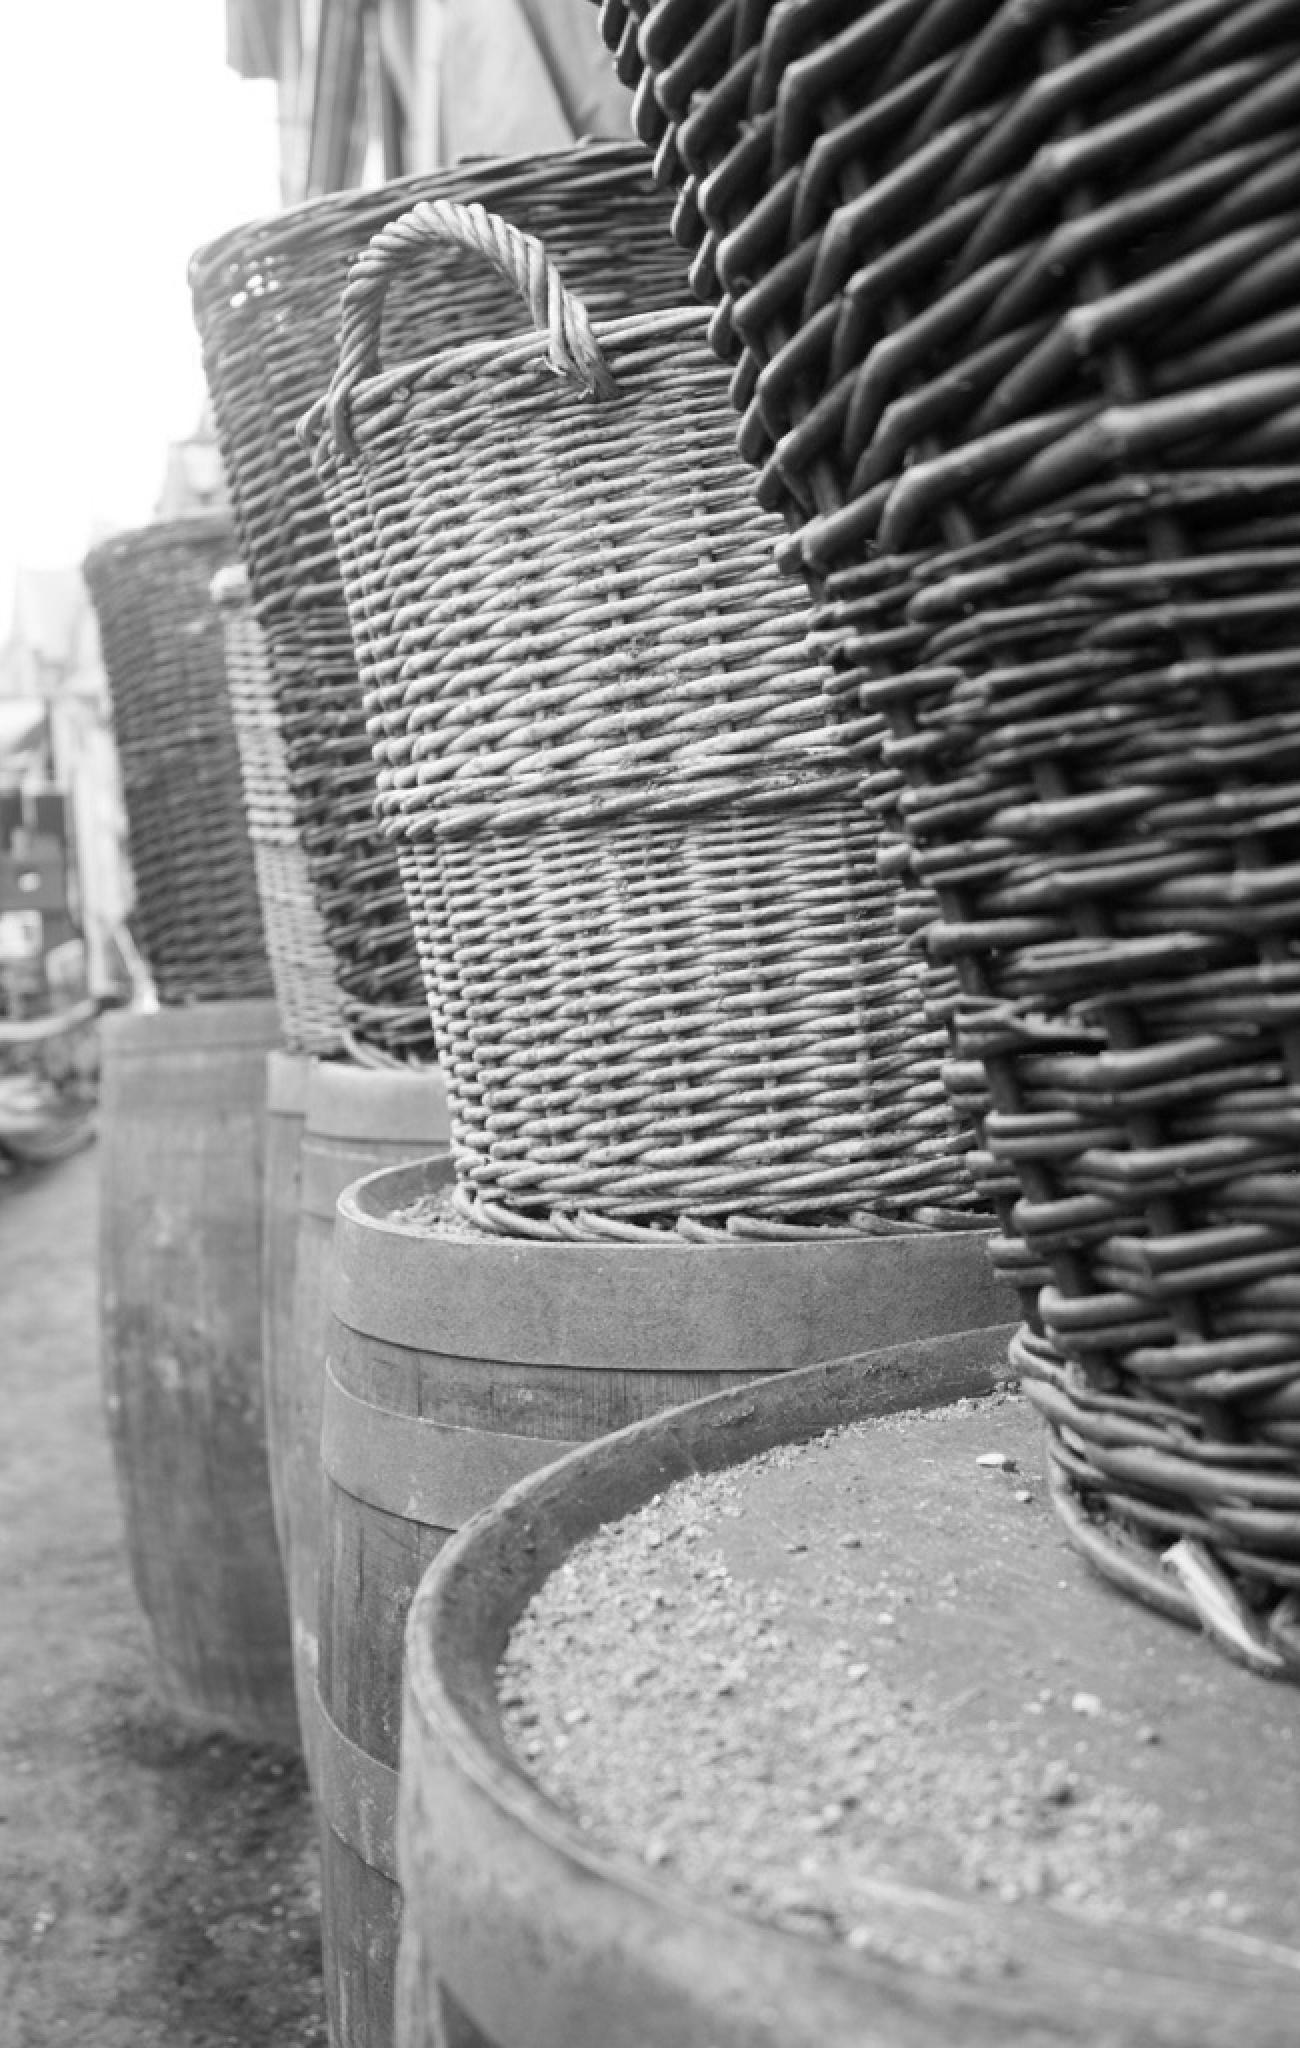 Basket and Barrels  by ScooEroticArt